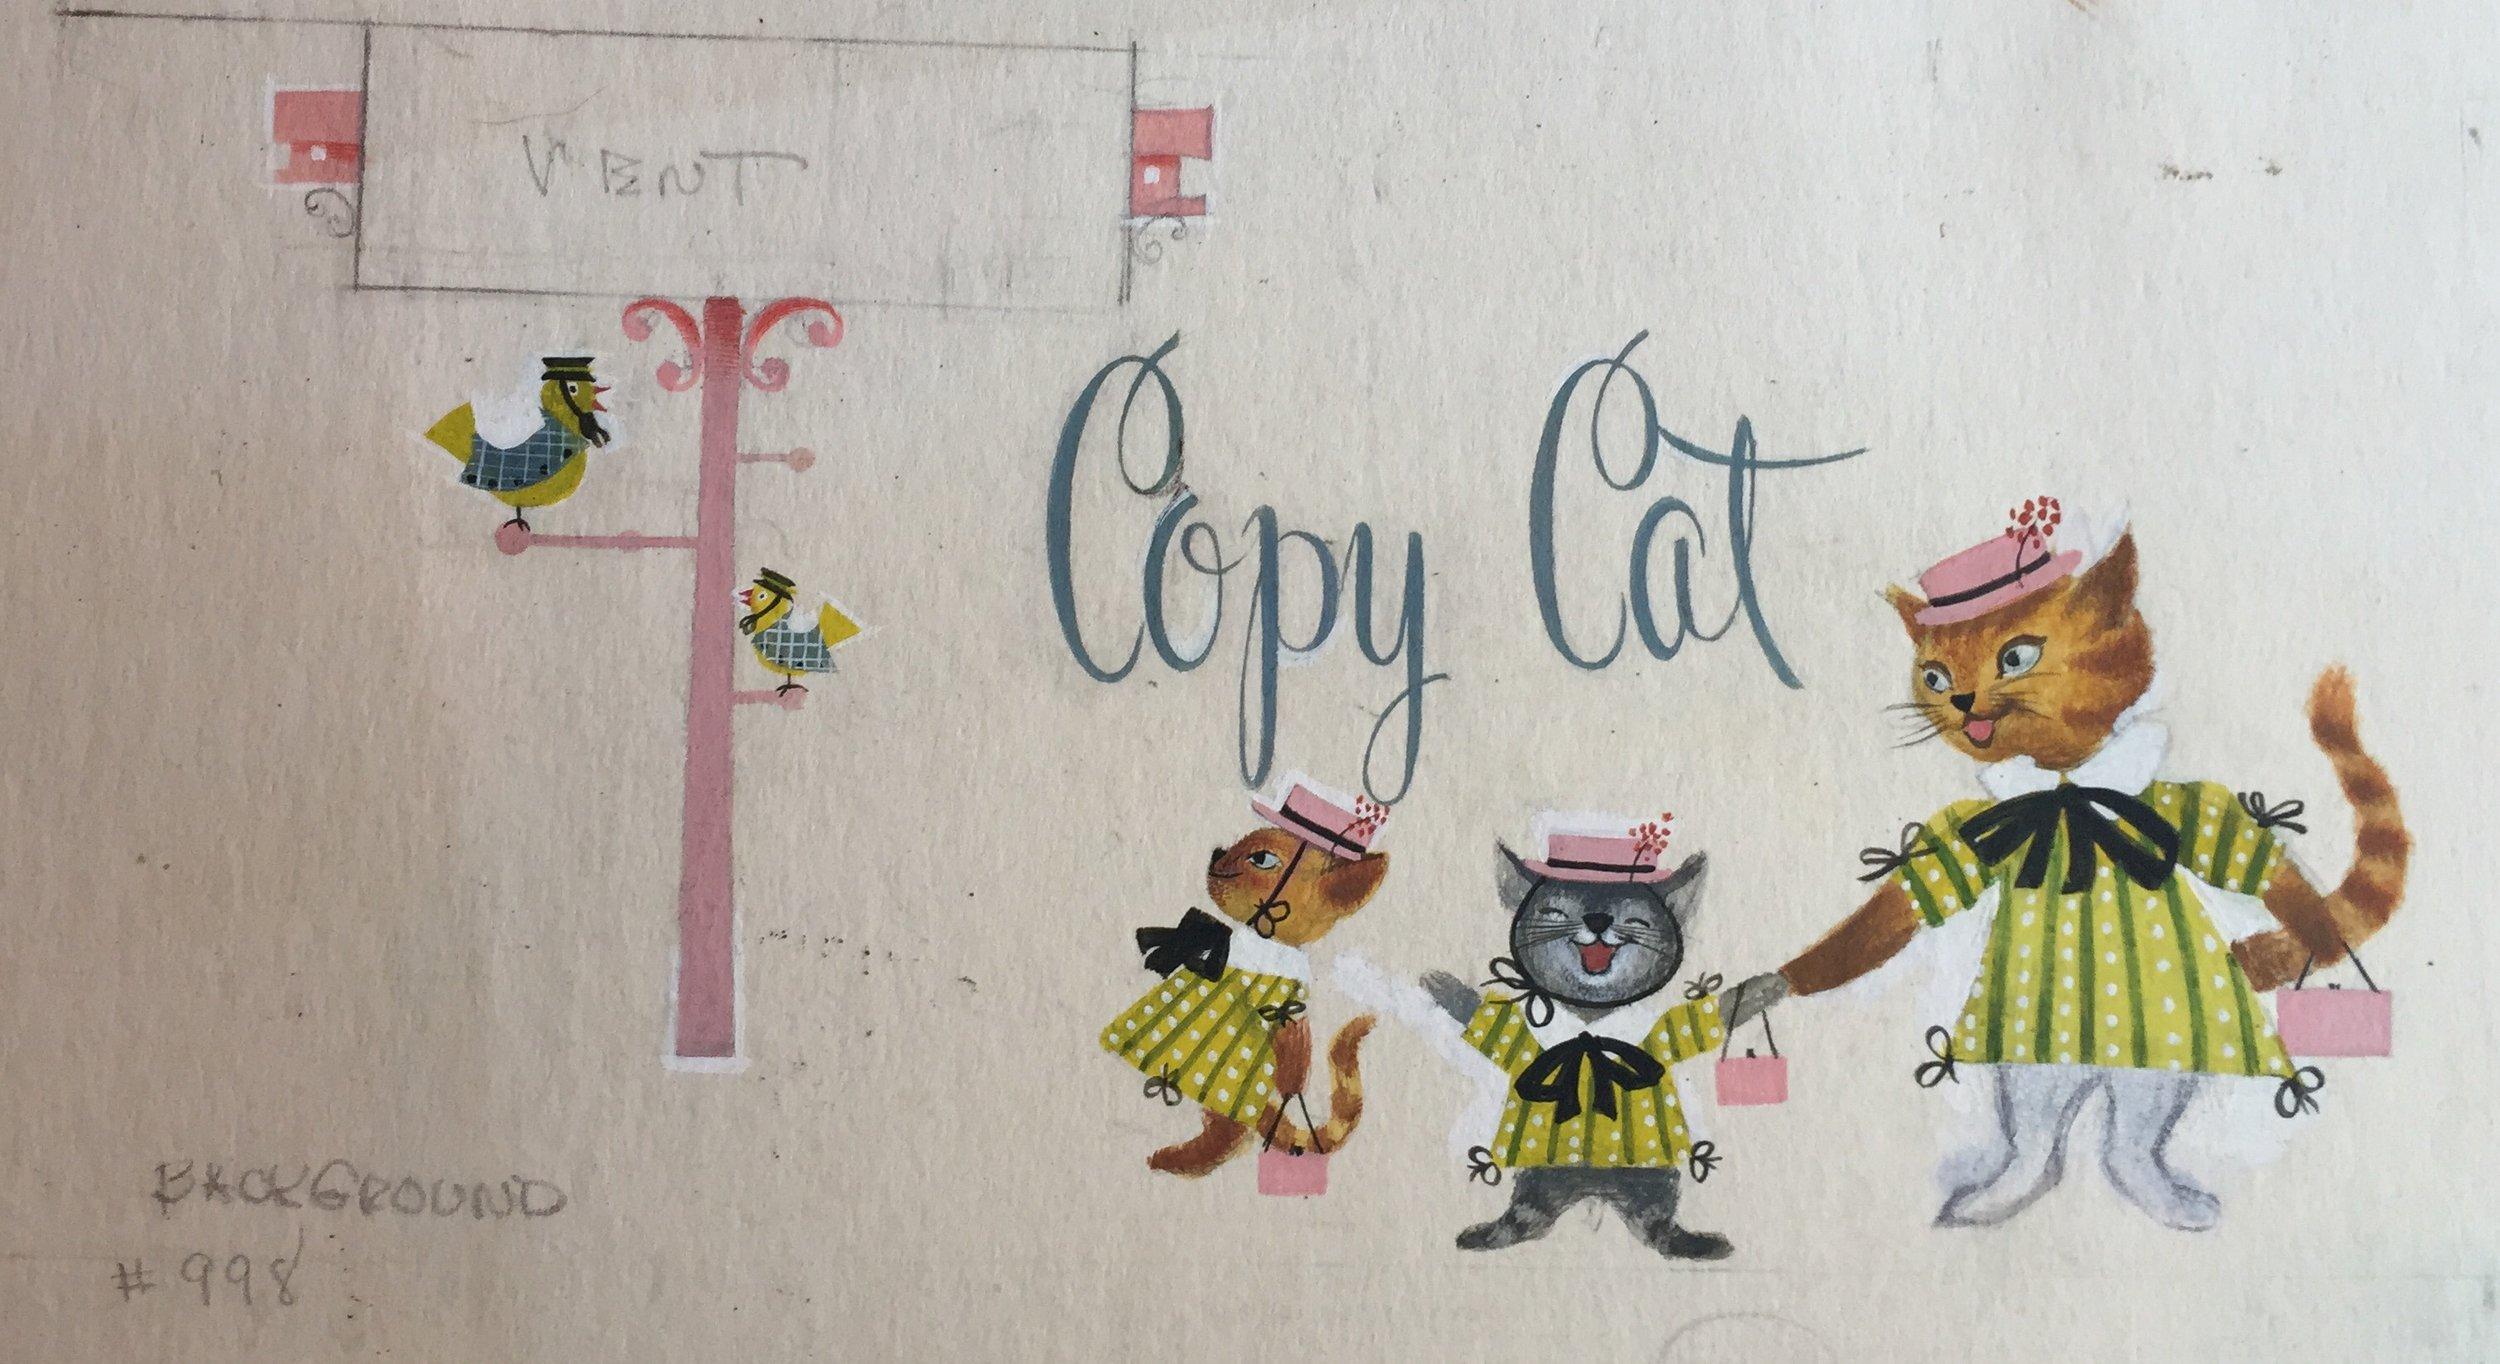 RM copy cat.jpeg